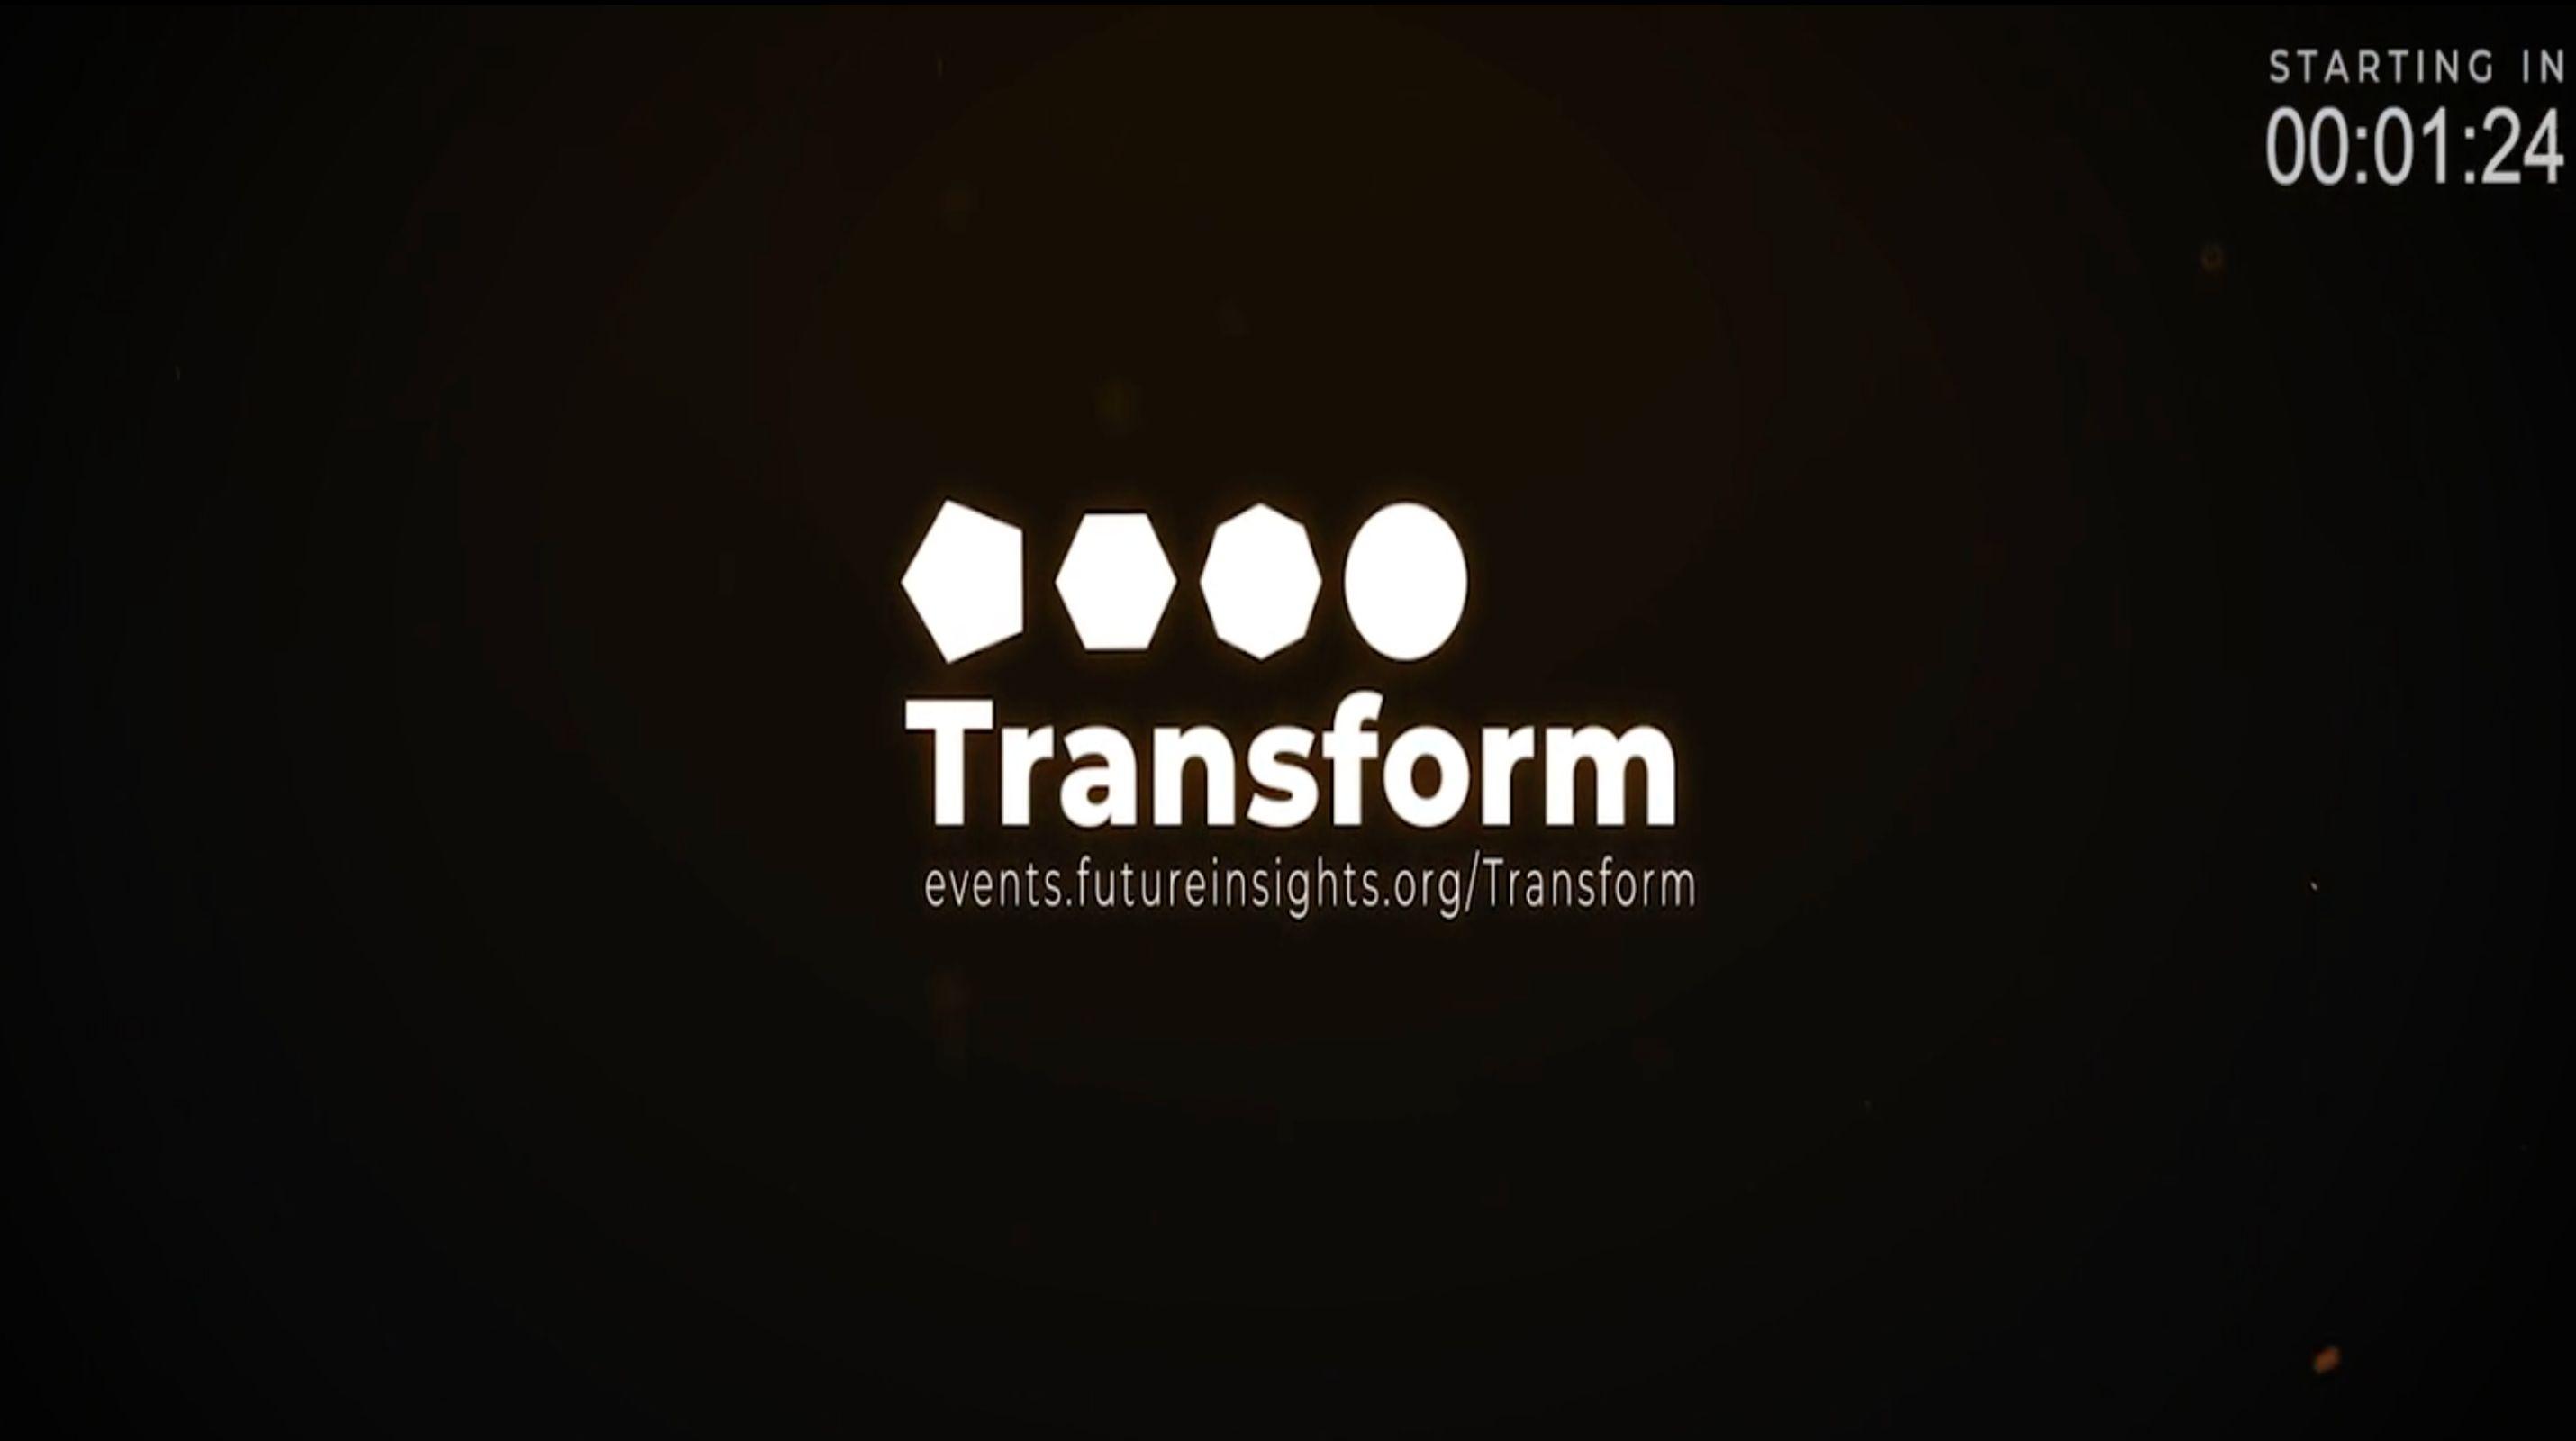 transform-video-thumbnail-2